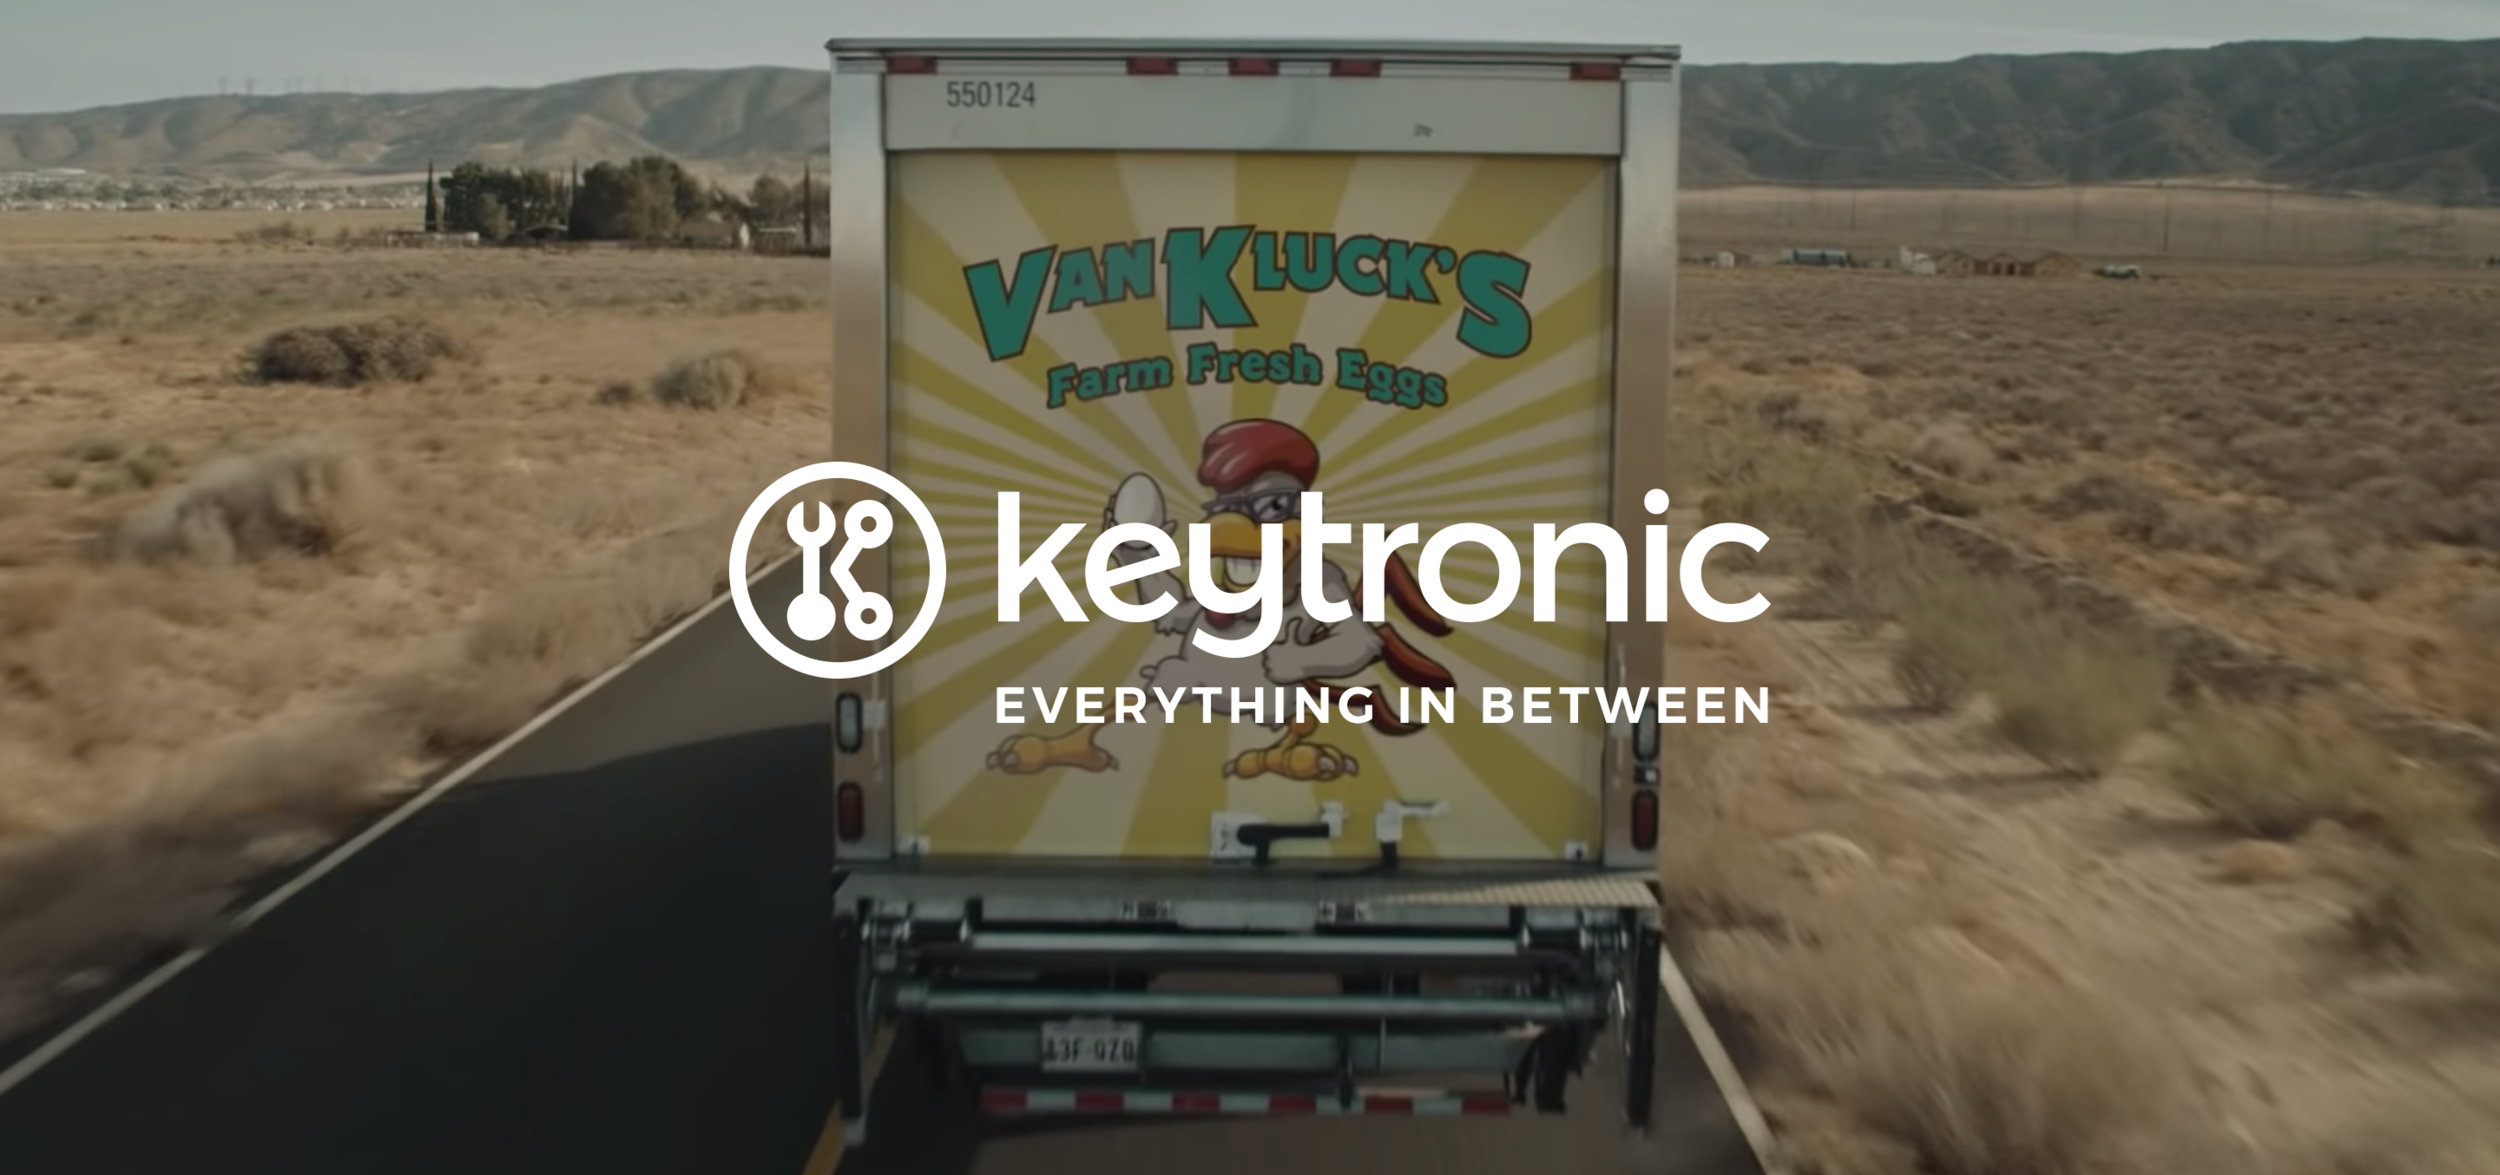 Keytronic_EverythingInBetween3.png